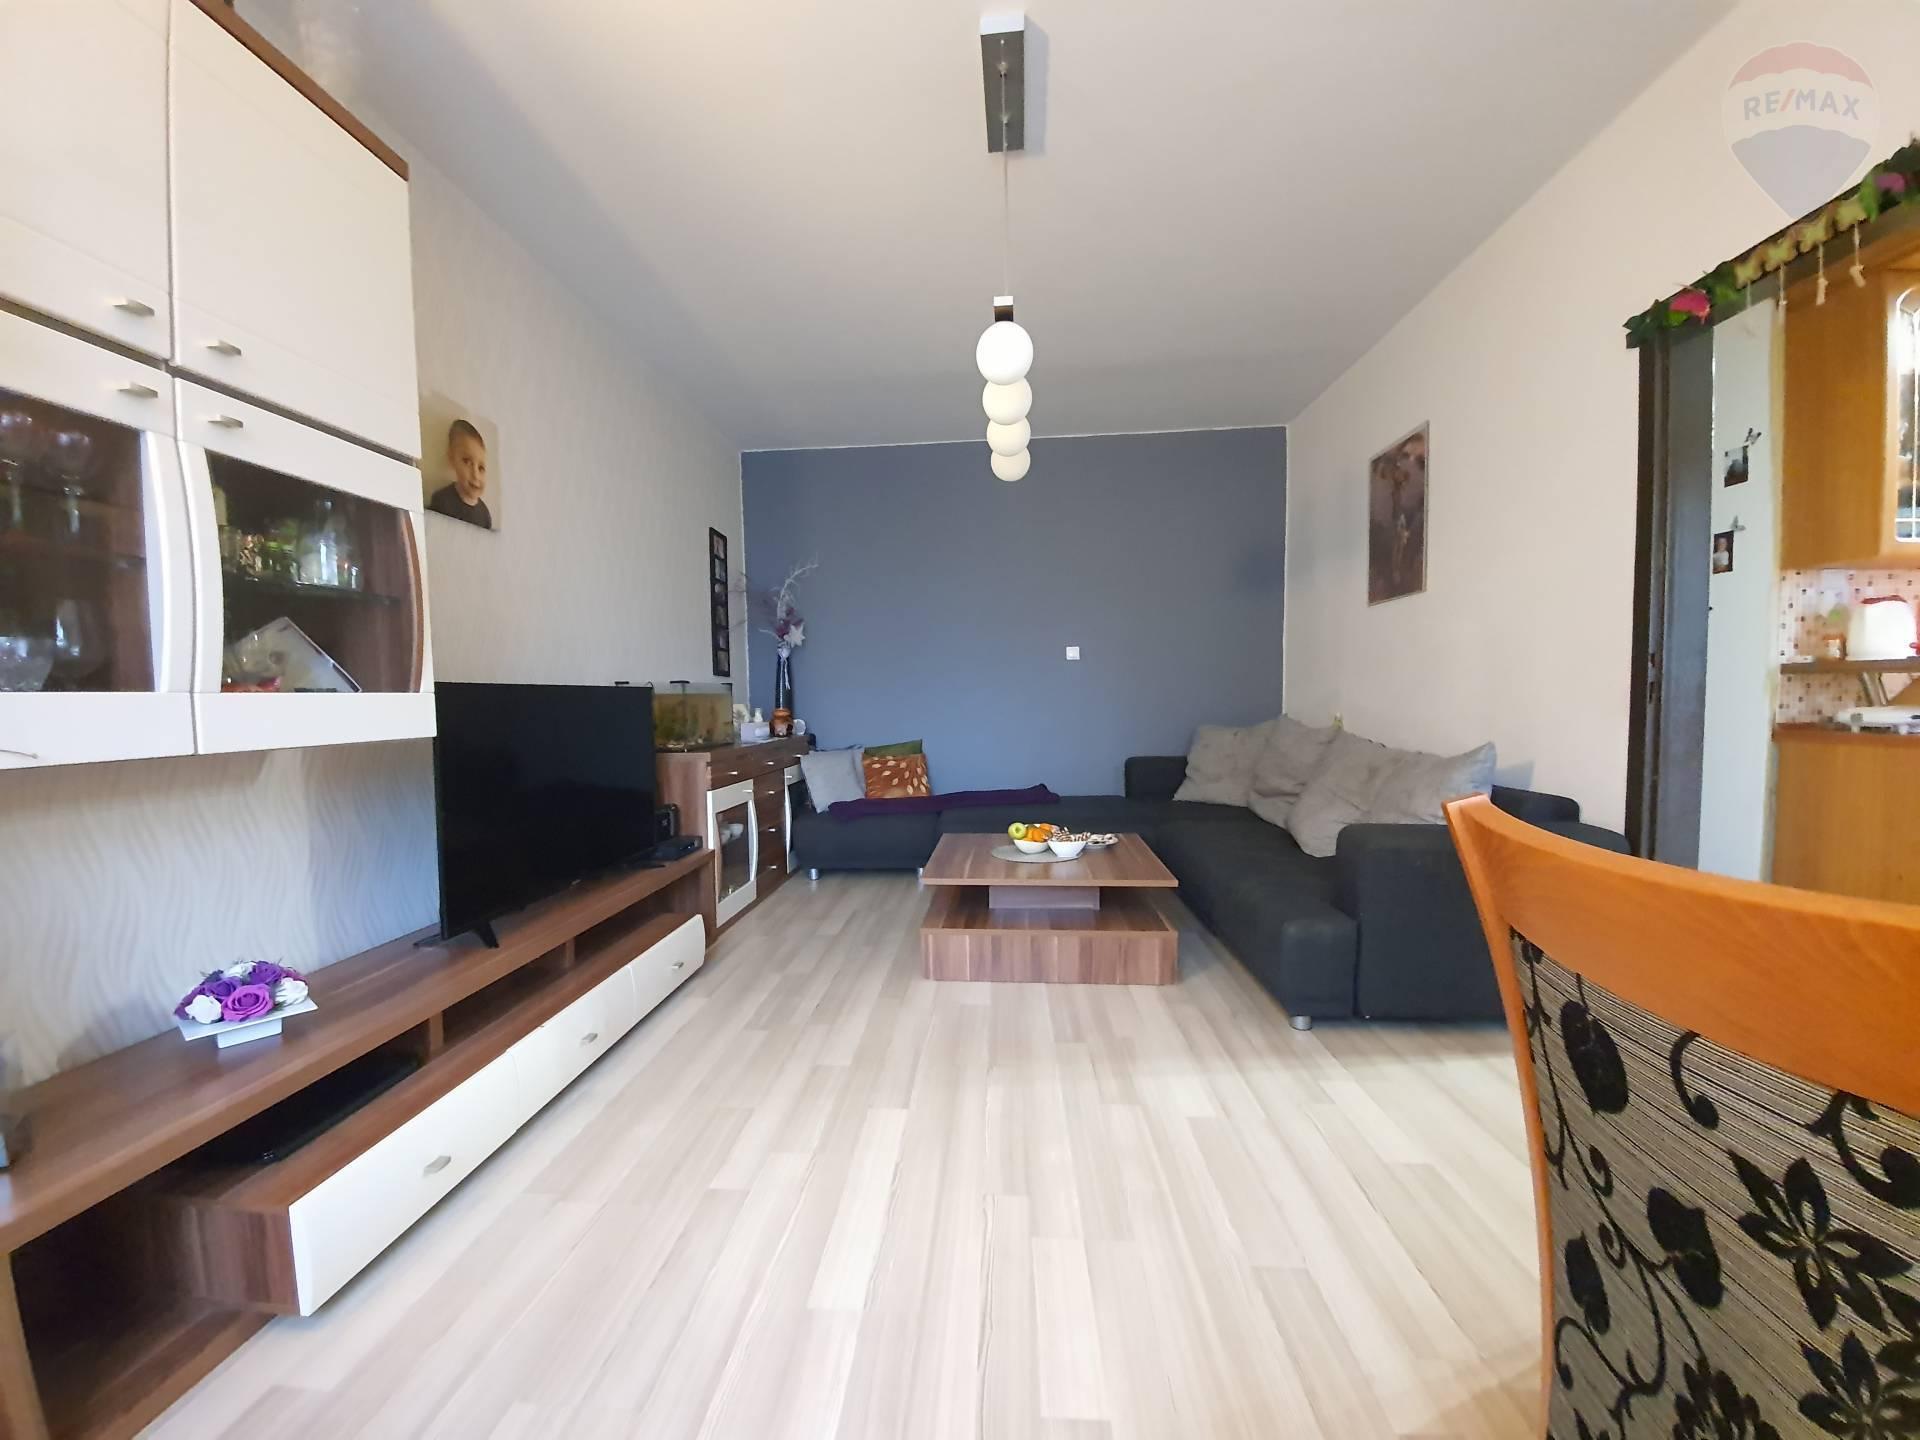 PREDÁM - 3 izbový byt, Topoľčany, balkón, sídlisko JUH